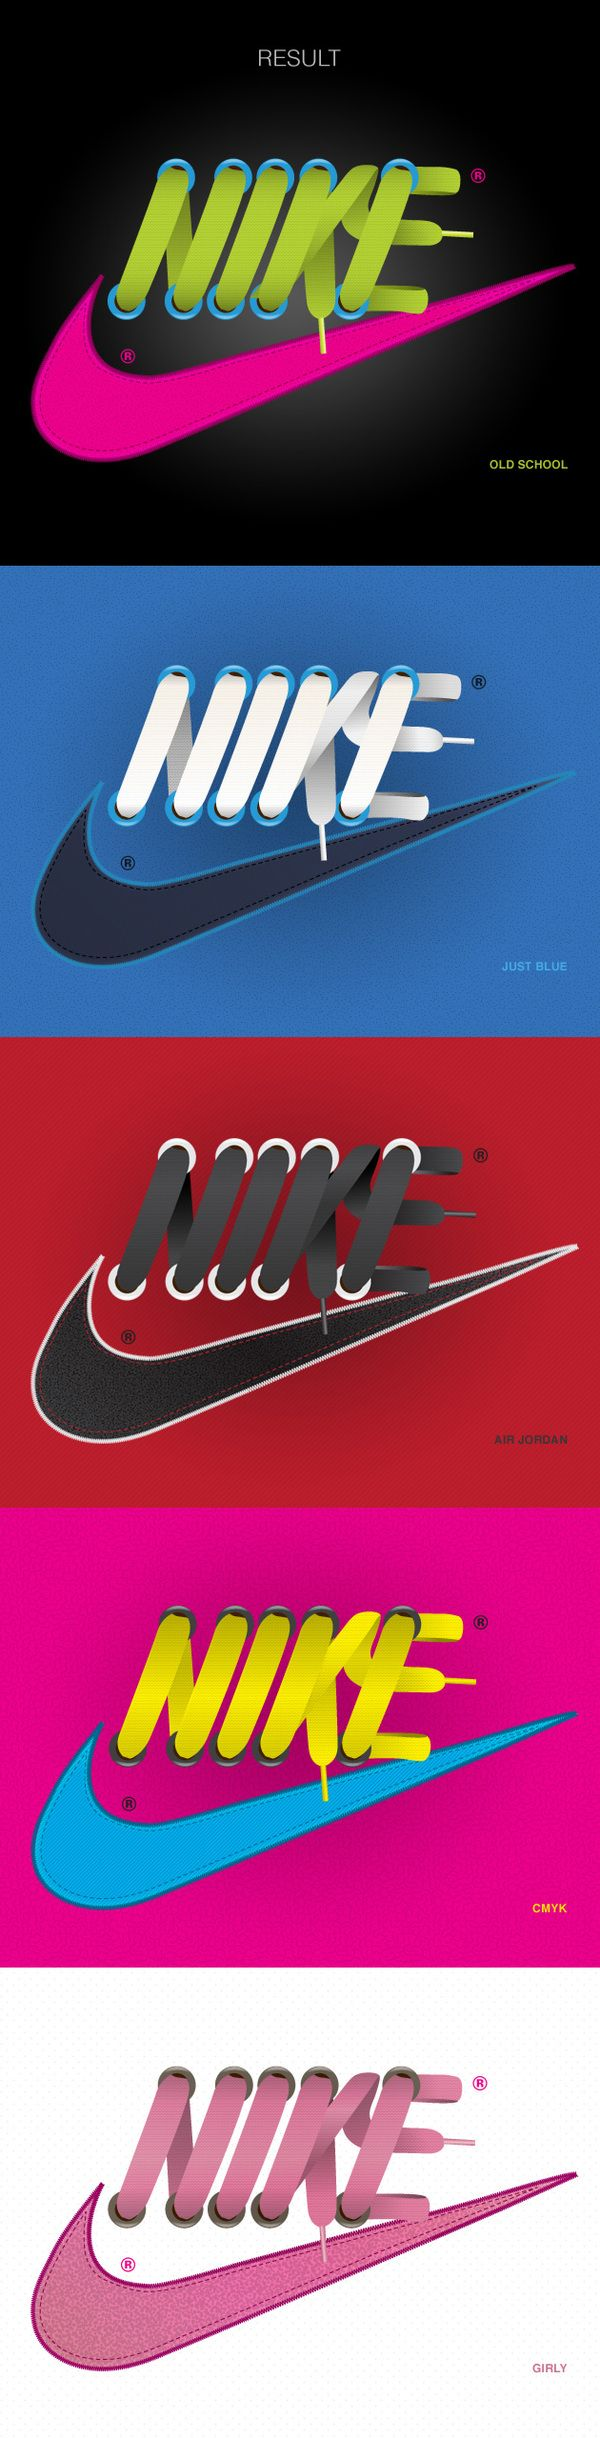 Shnurki Nike Ugo Silva In 2020 Graphic Design Logo Graphic Design Inspiration Logo Design